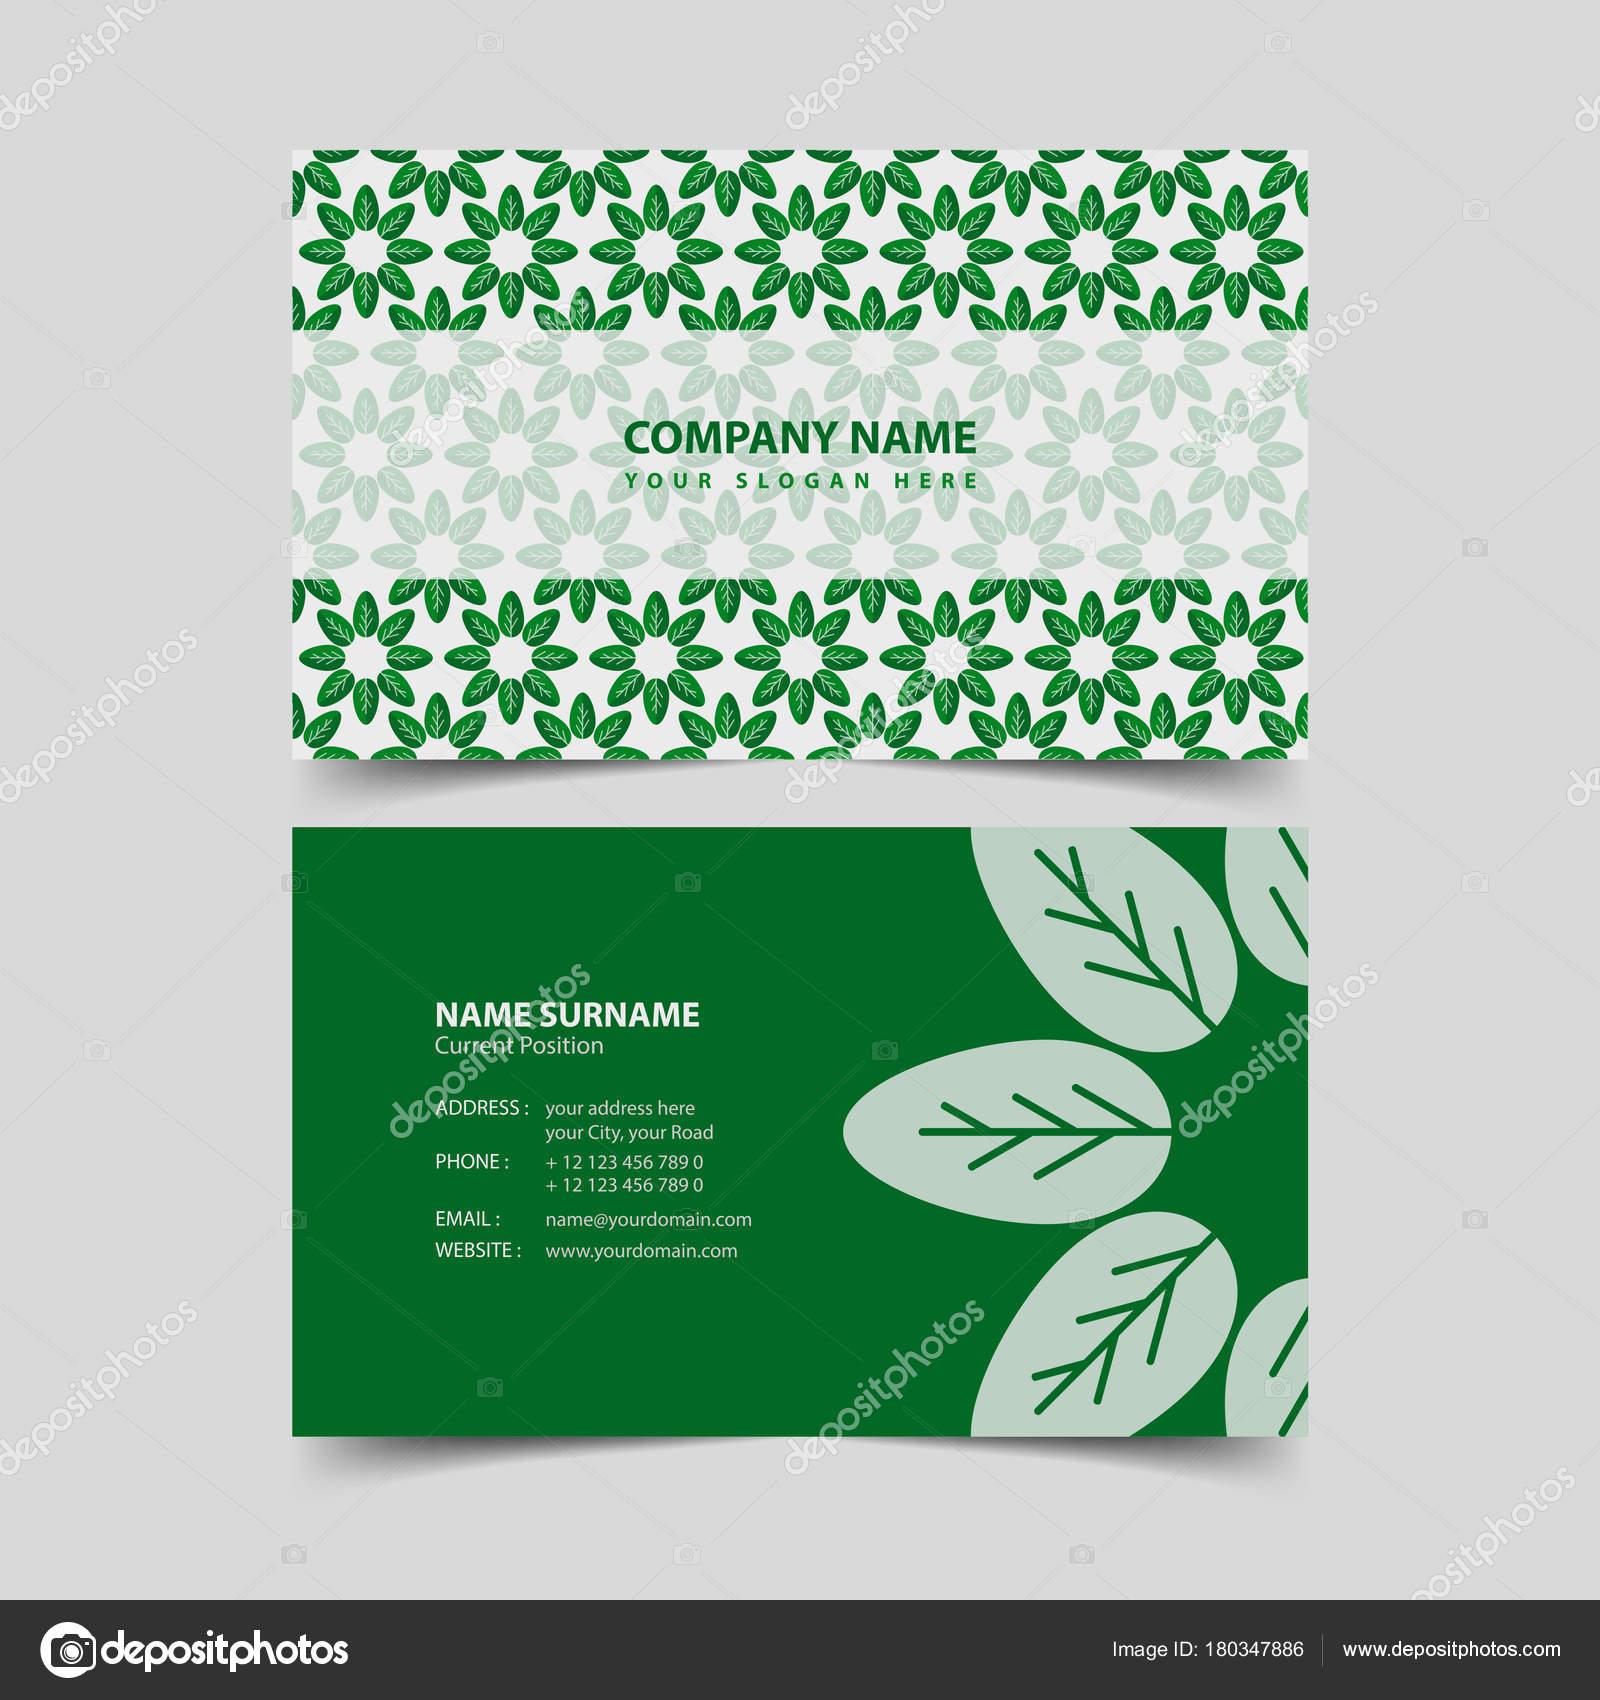 Eco friendly business card design template stock vector eco friendly business card design template stock vector colourmoves